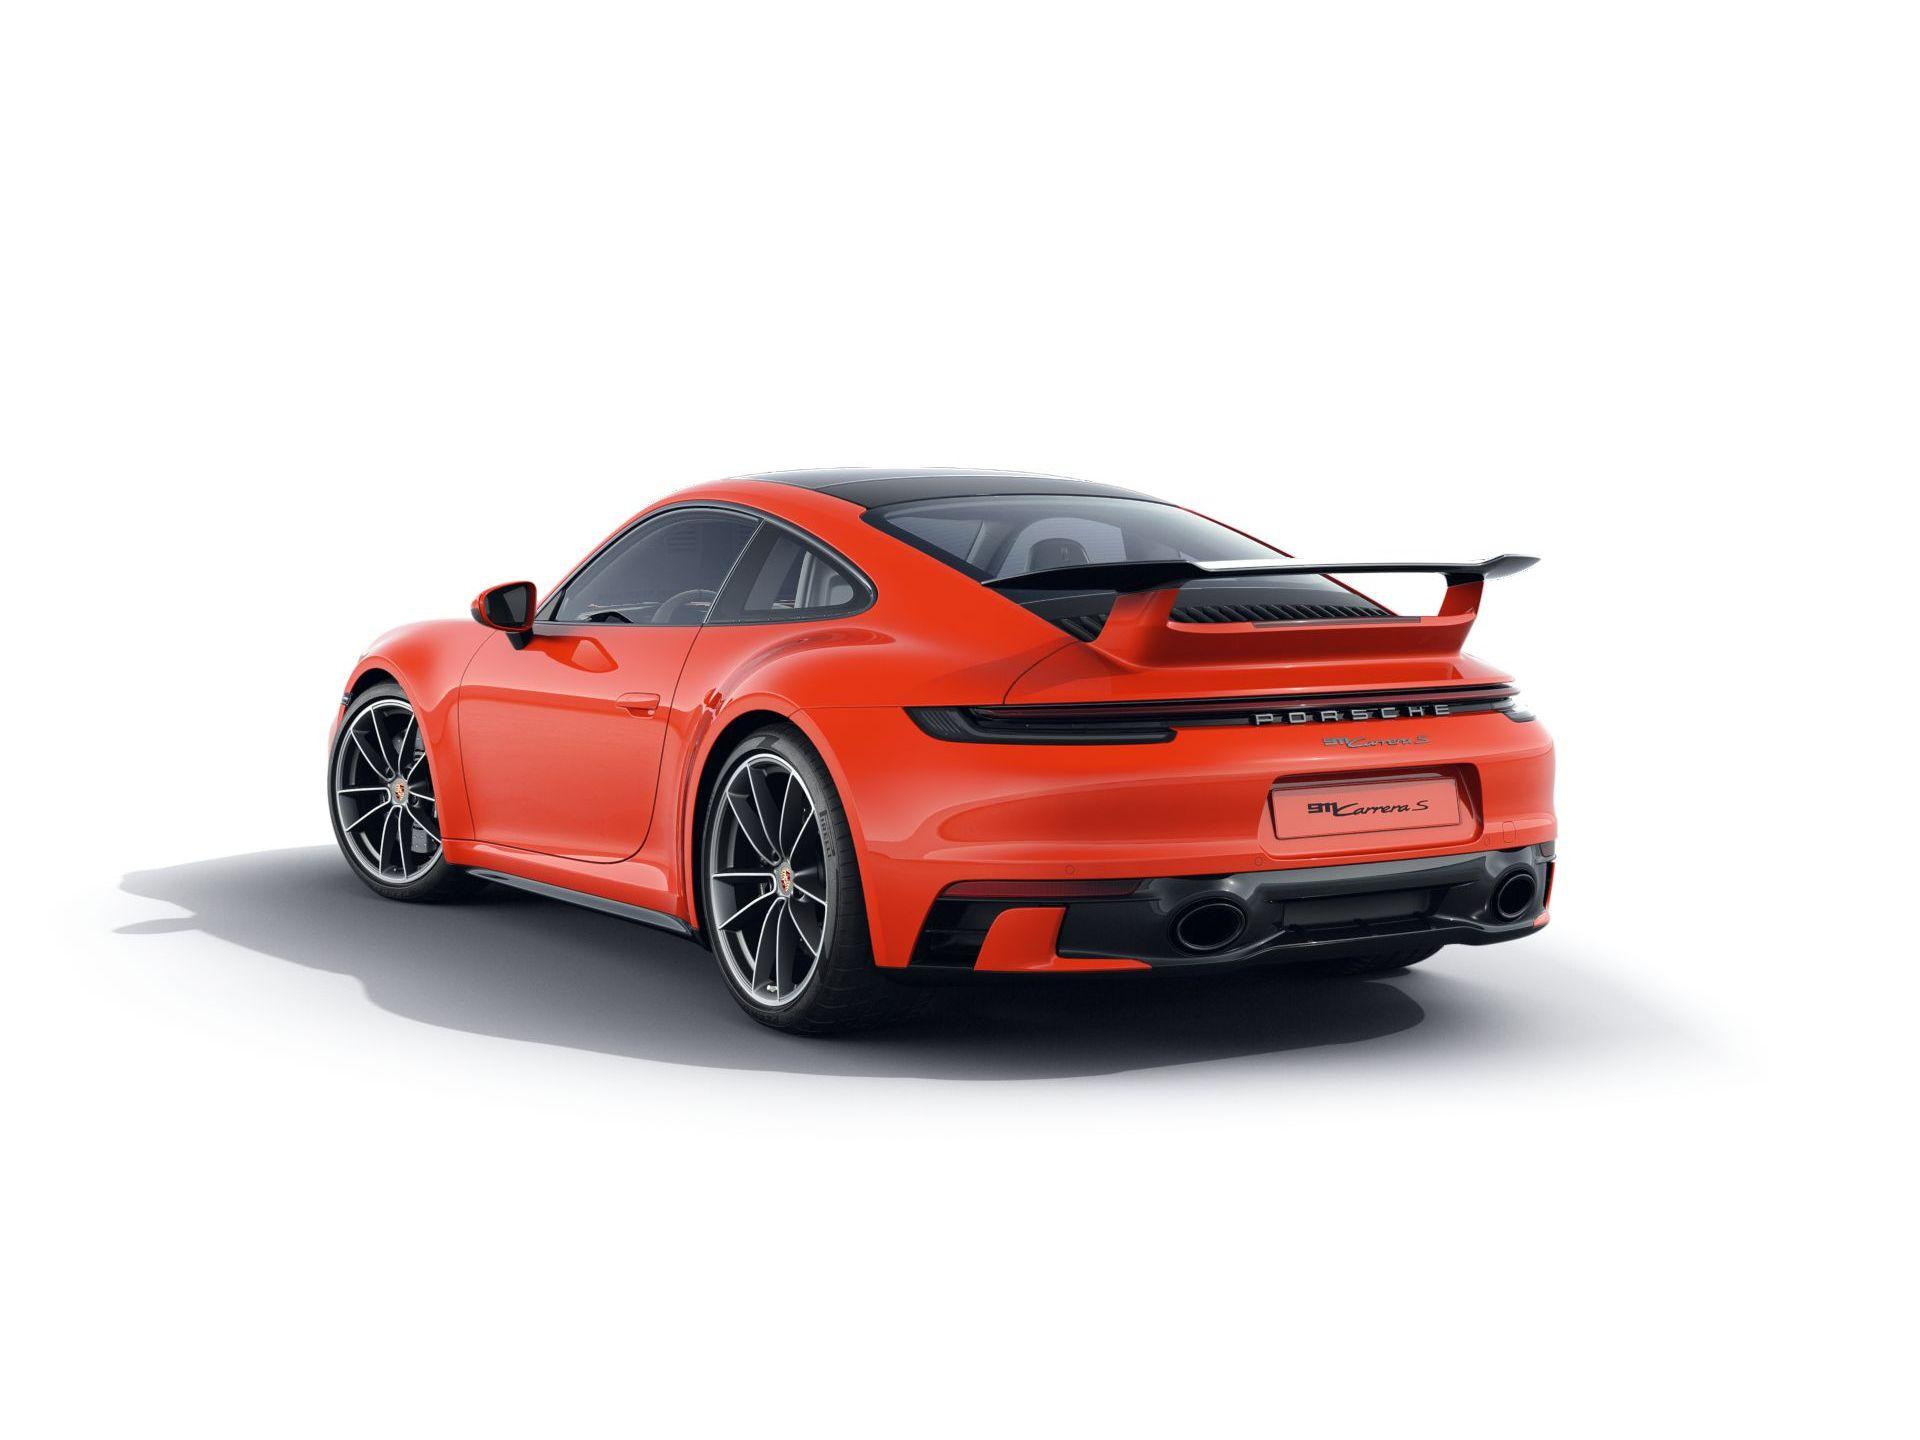 2022 Porsche 911 Carrera S – 3